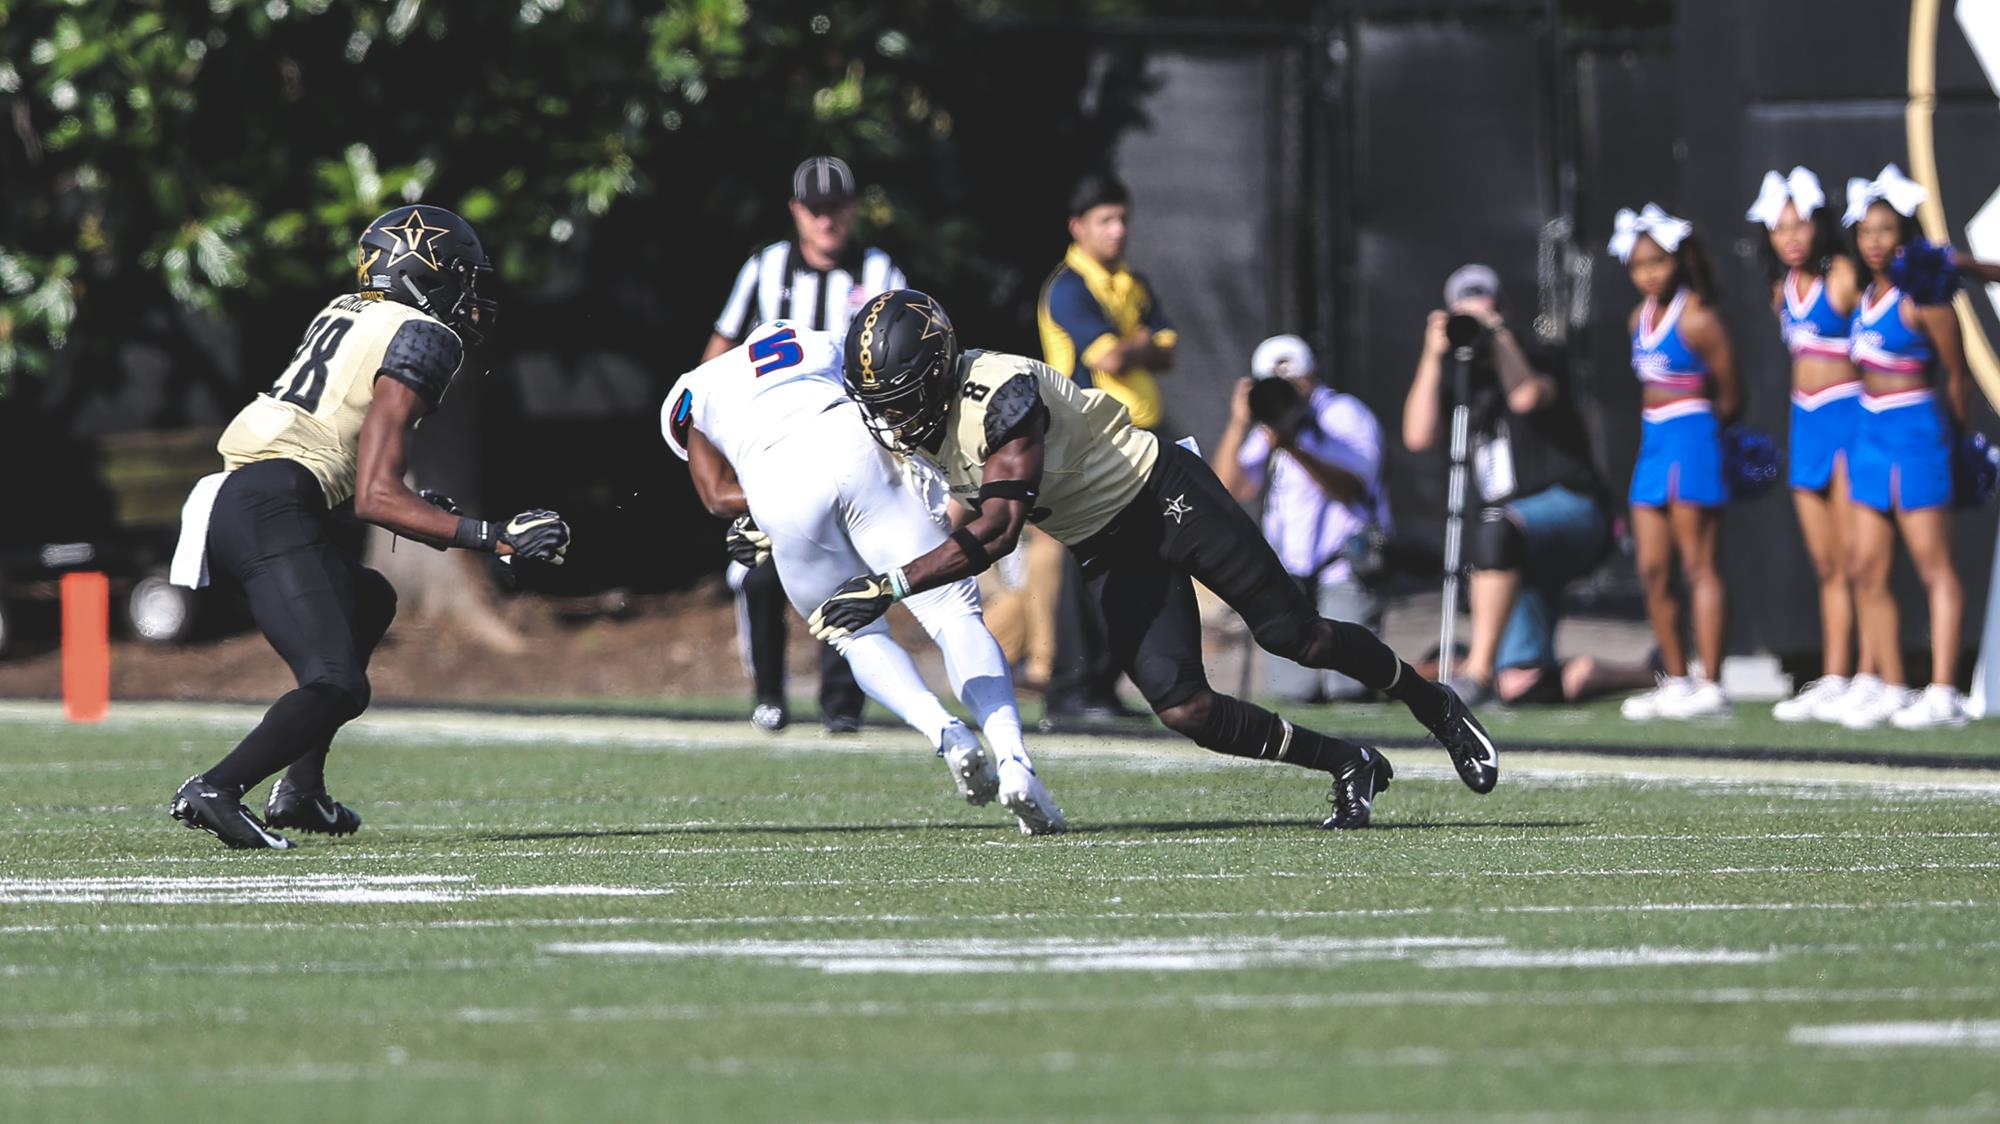 1542d0232 Allan George - Football - Vanderbilt University Athletics